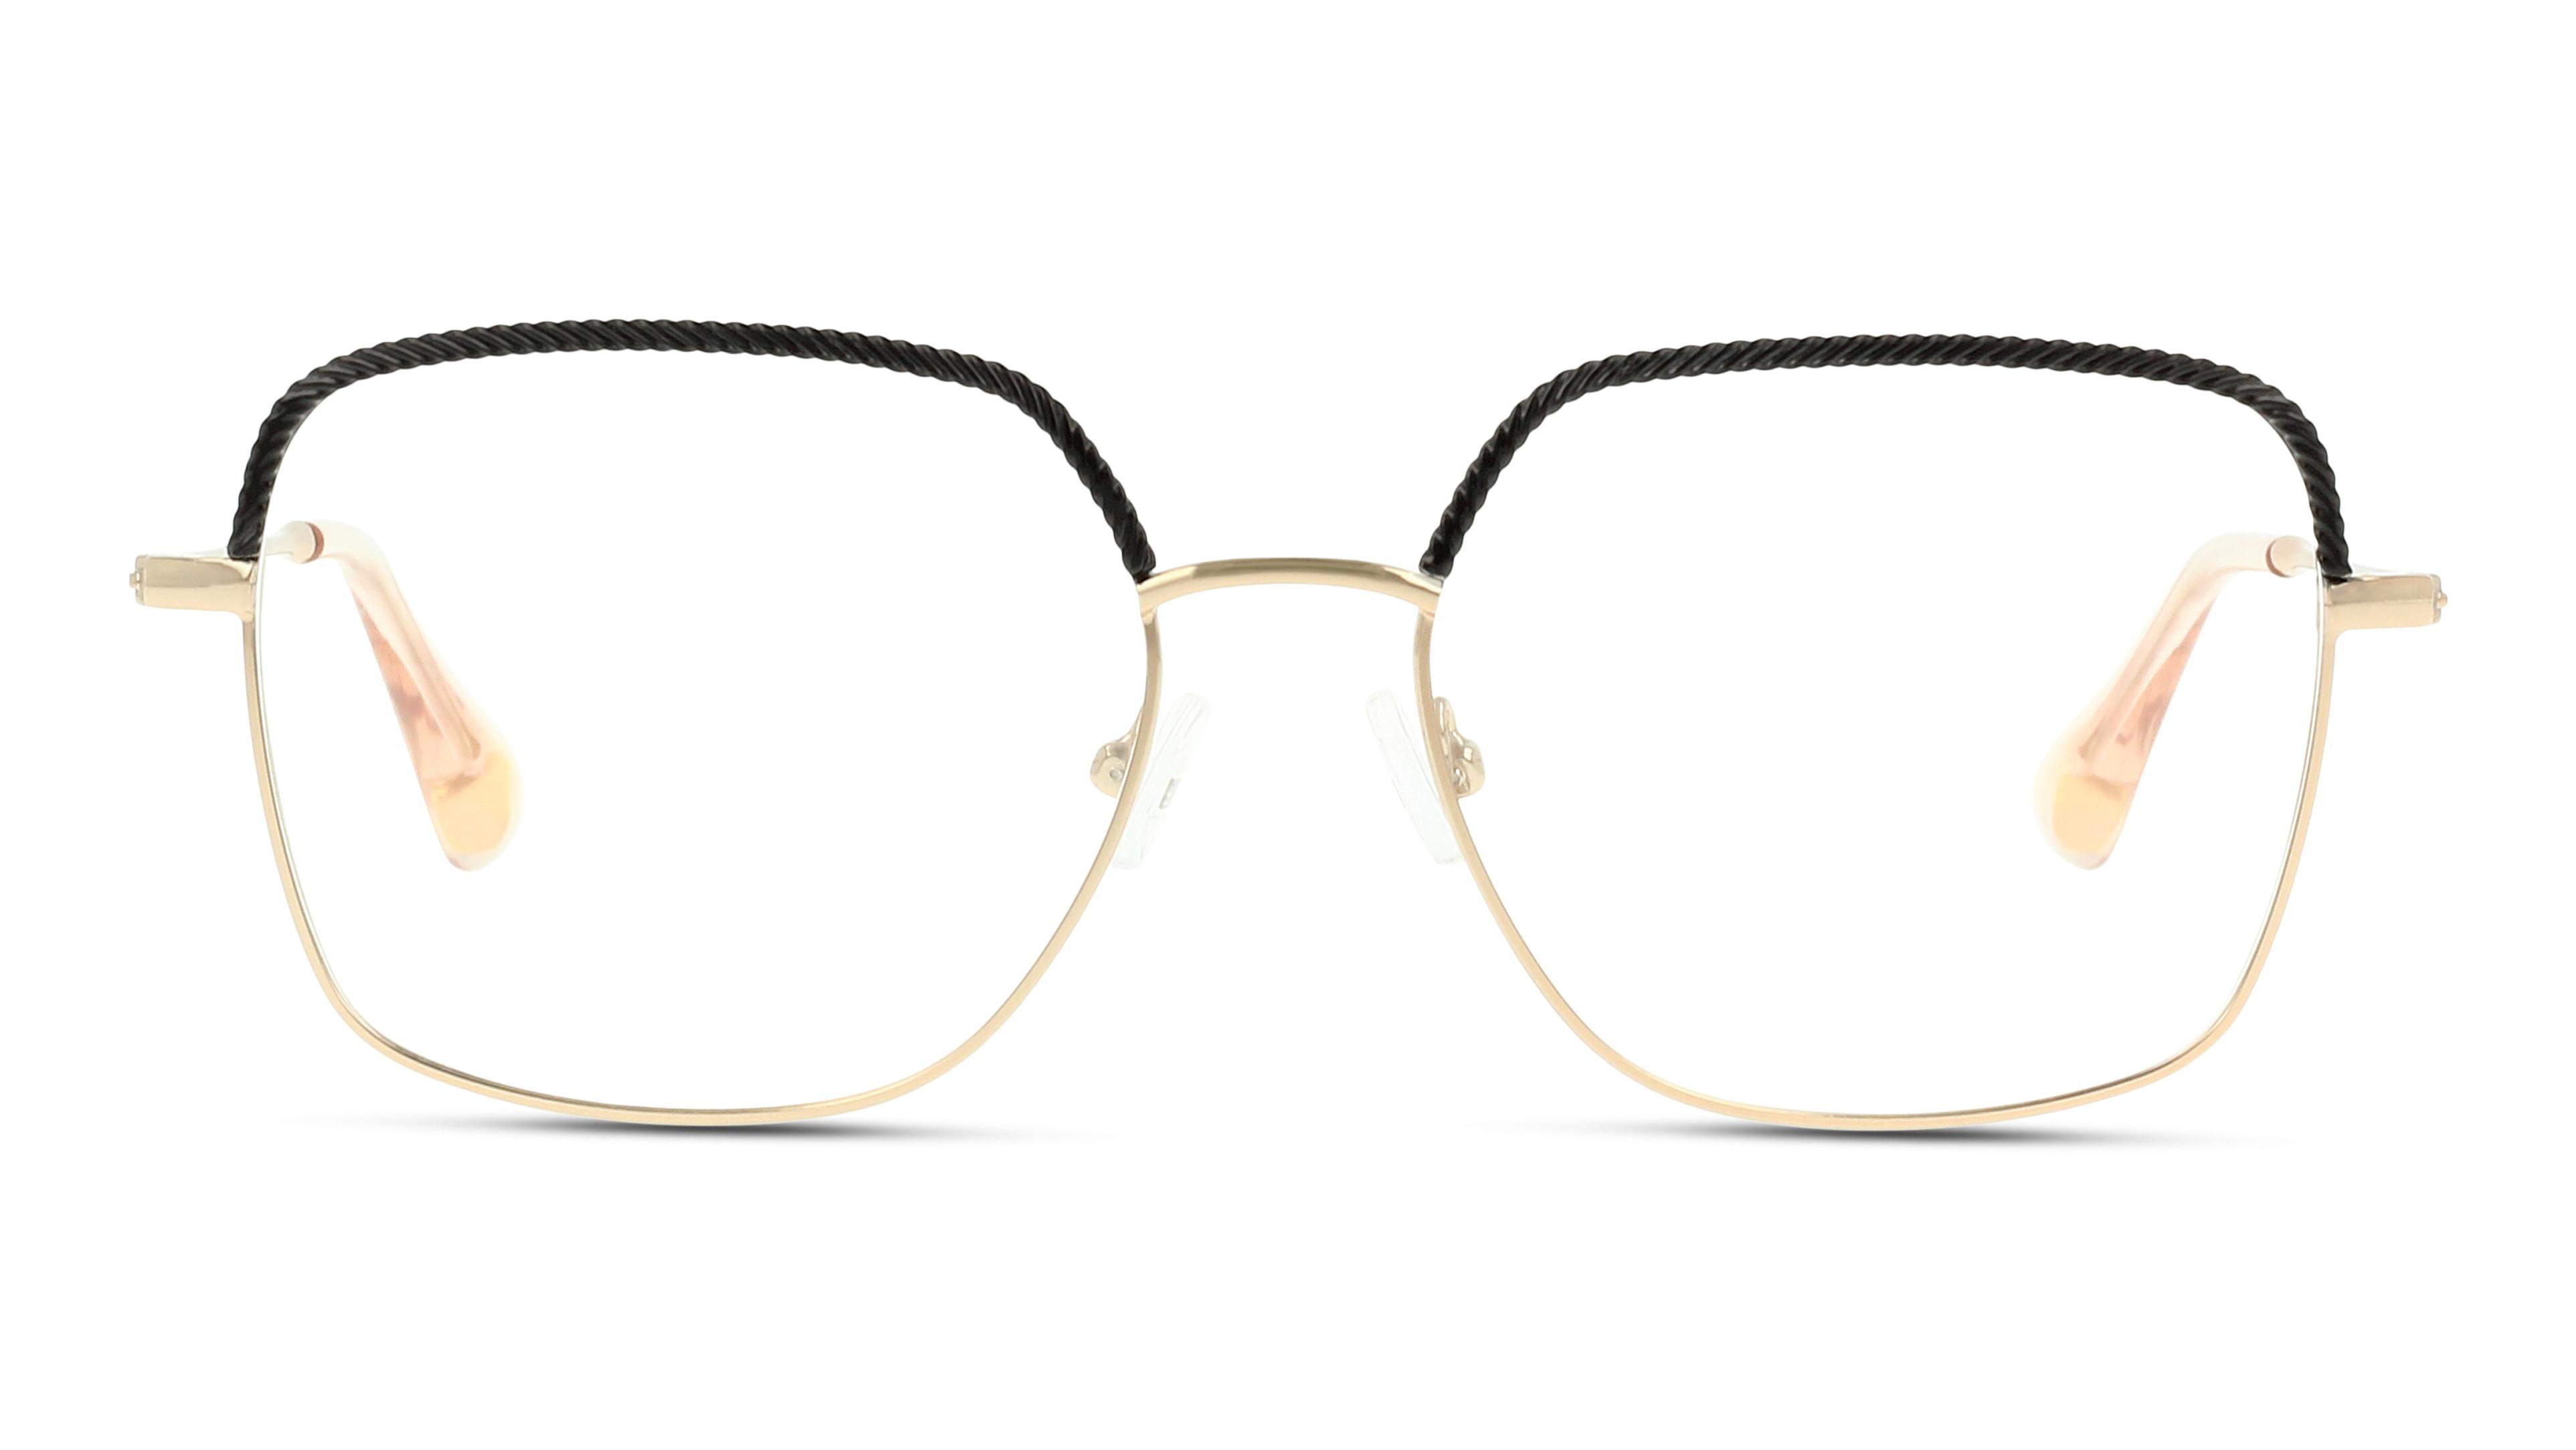 8719154573897-front-01-sensaya-sykf07-eyewear-black-gold